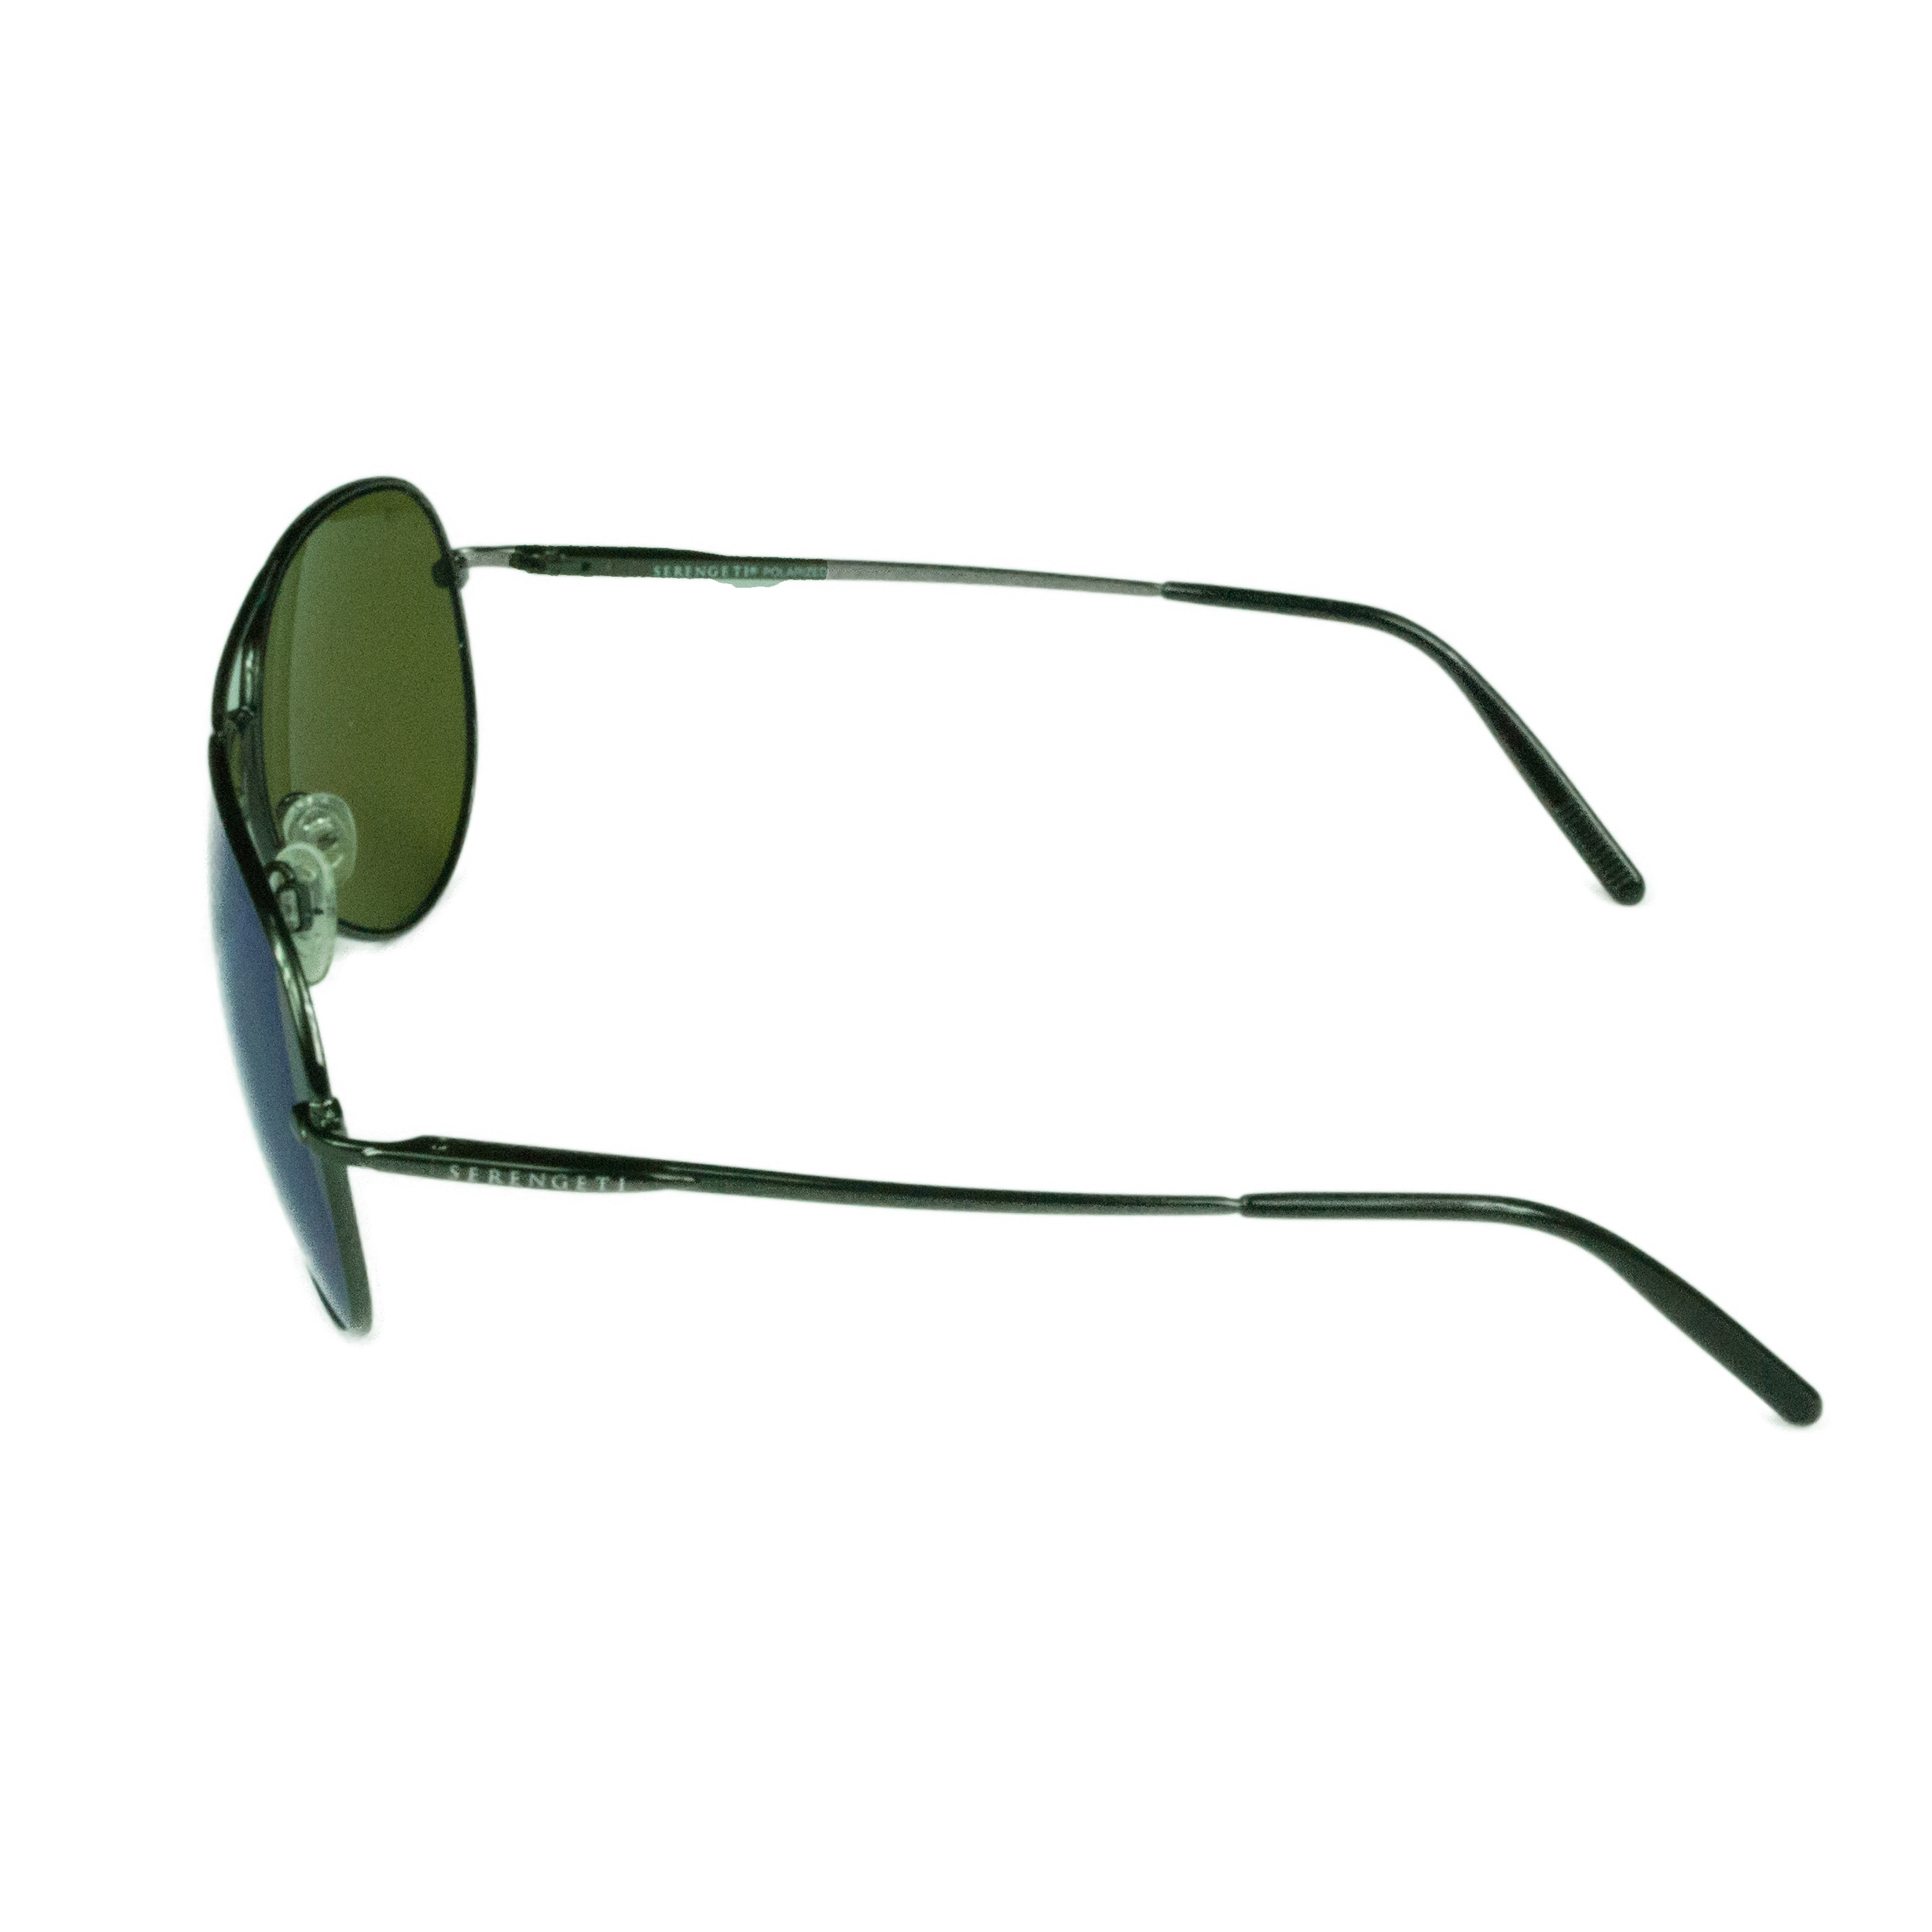 ed0376ebbf Shop Serengeti Fashion Unisex Medium Aviator 8265 Shiny Dark Gunmetal w  Polarized  555NM Blue Lens Sunglasses - Ships To Canada - Overstock.ca - 18183613